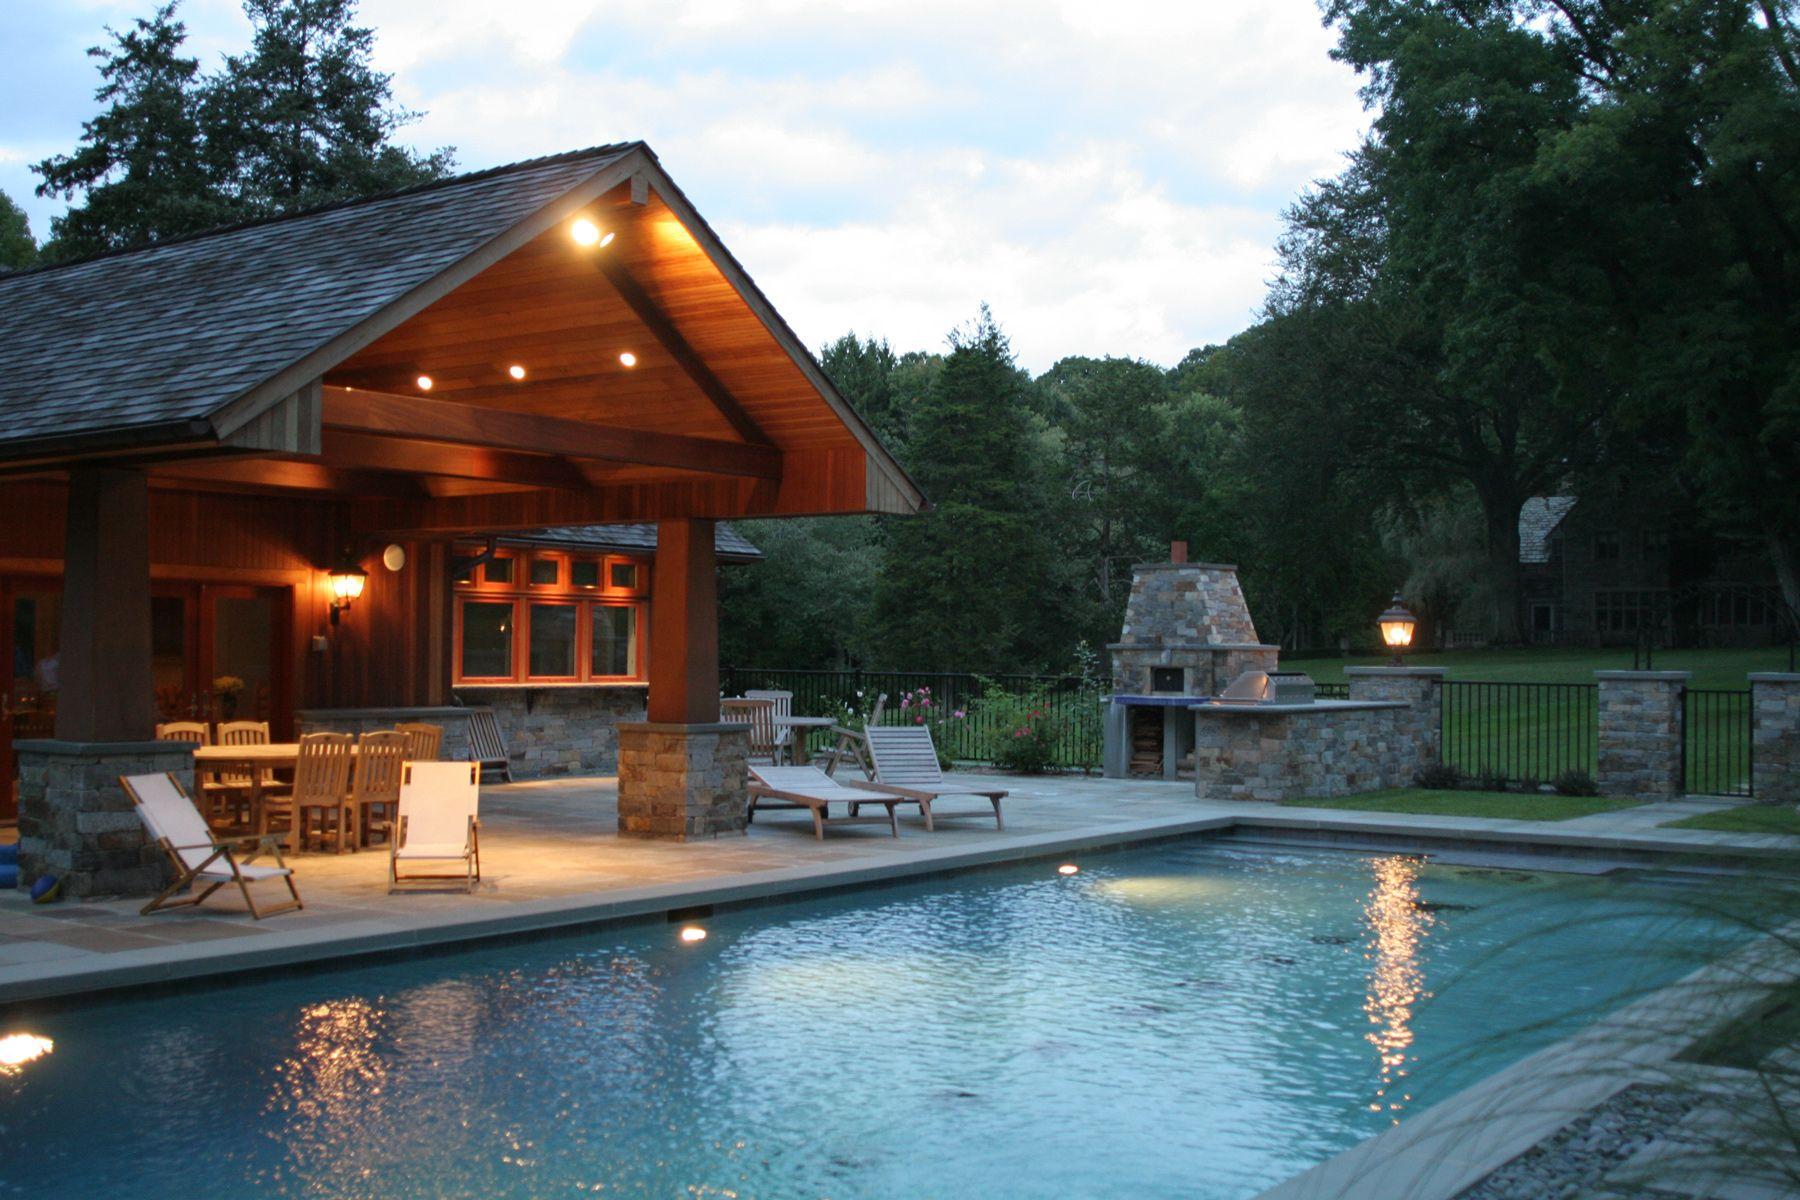 pool house ideas designs. zamp.co